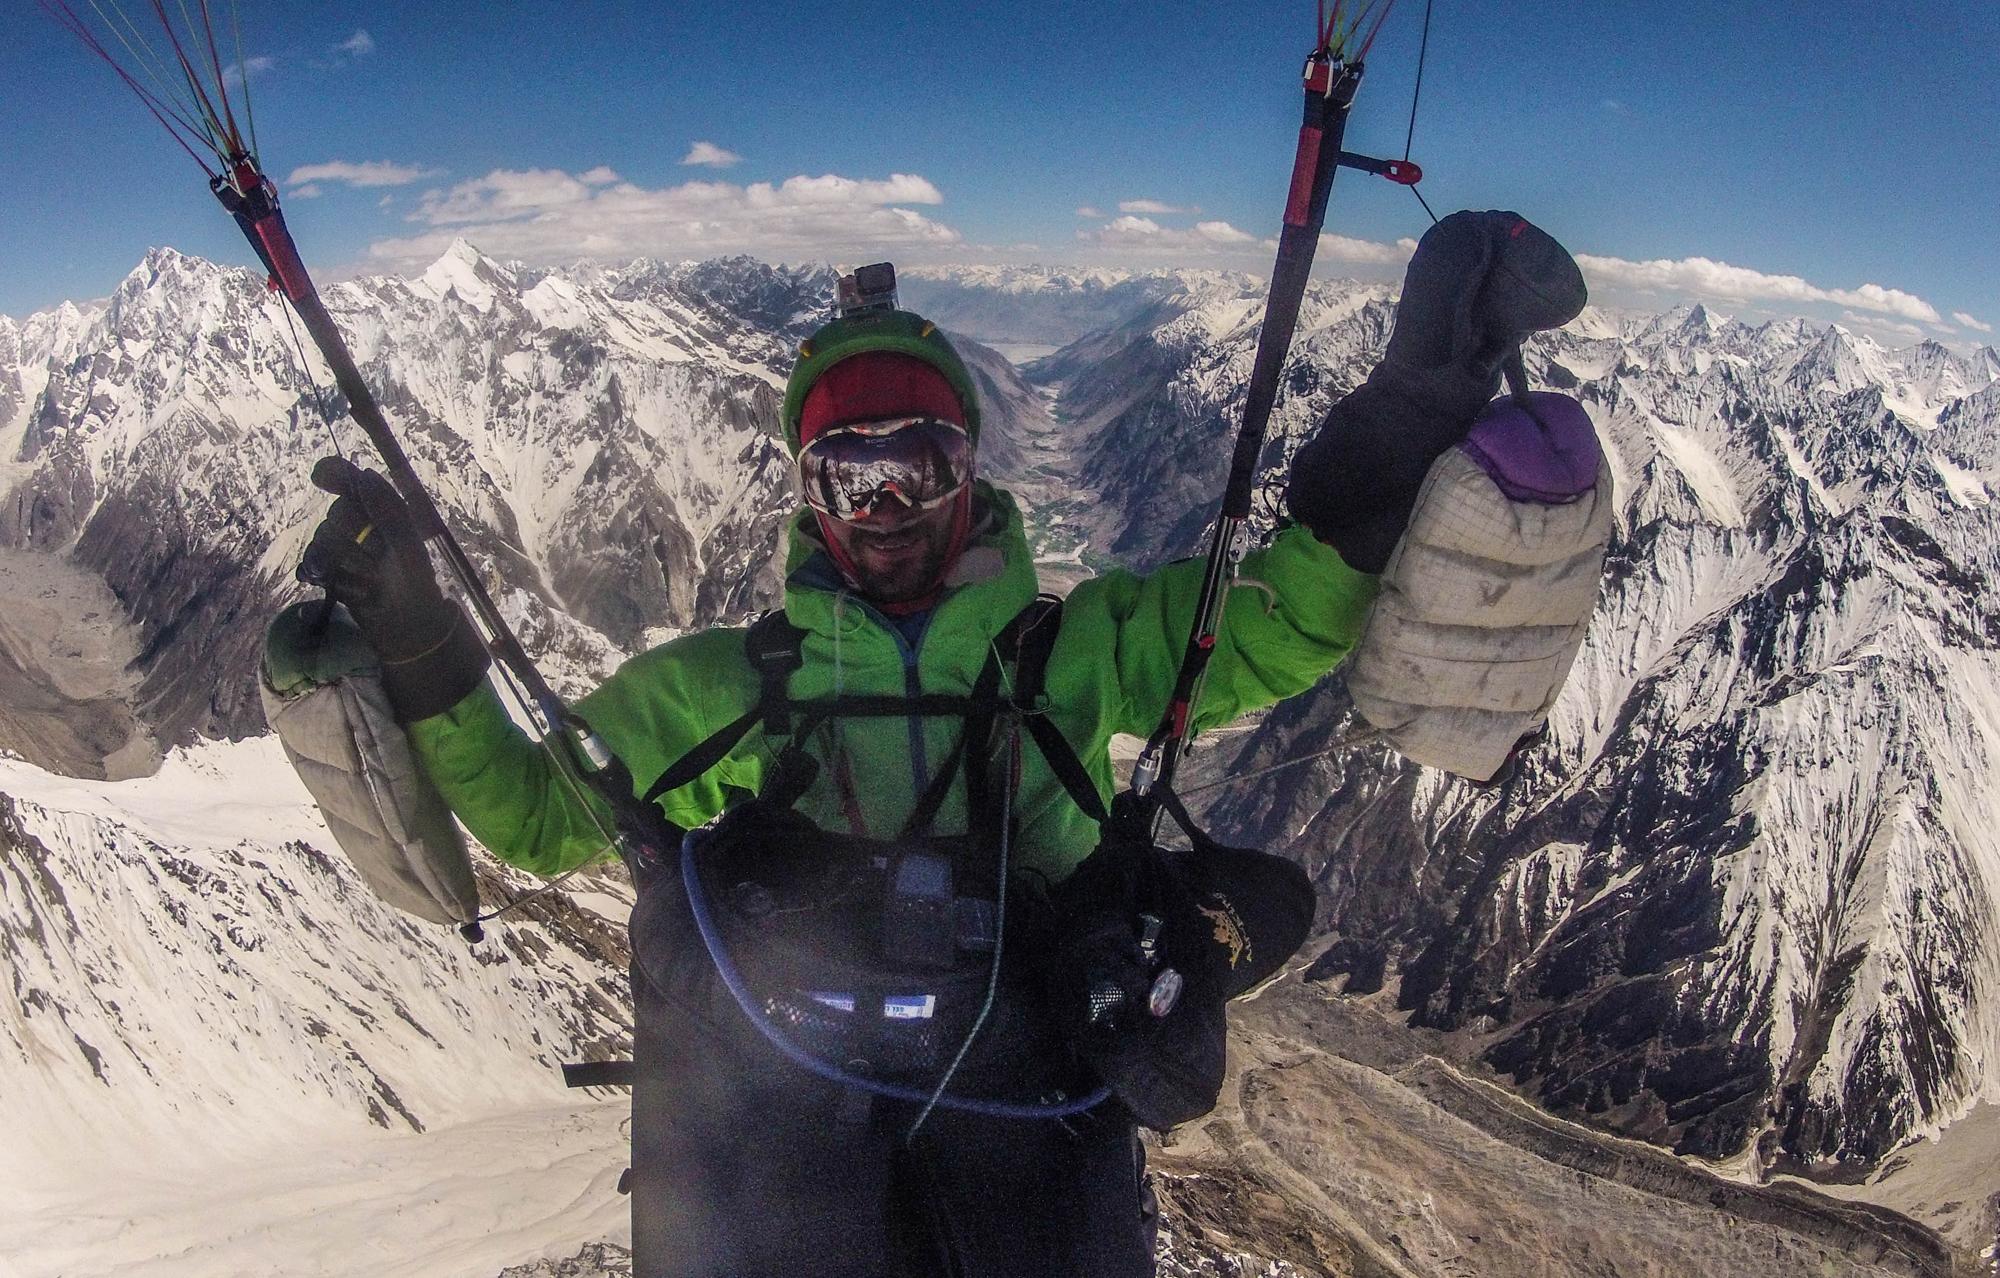 Pakistan expe Karakoram Ragolski Francois at 6500m